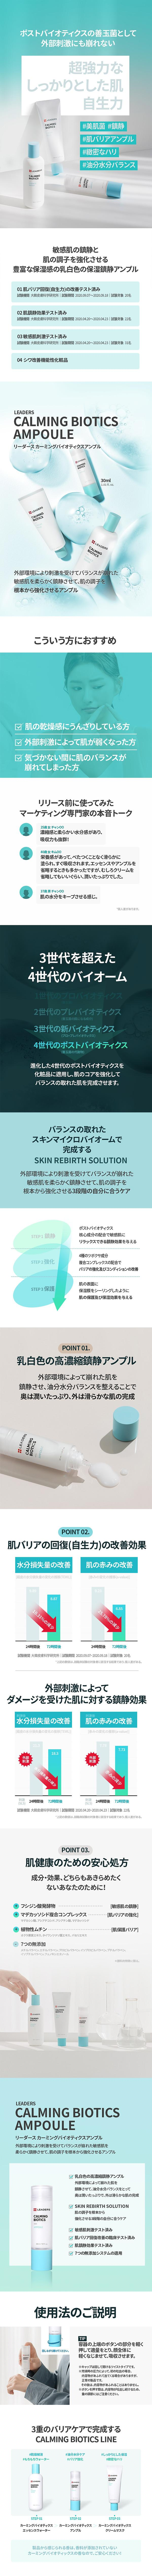 jp_calmingbiotics_ampoule_800.jpg